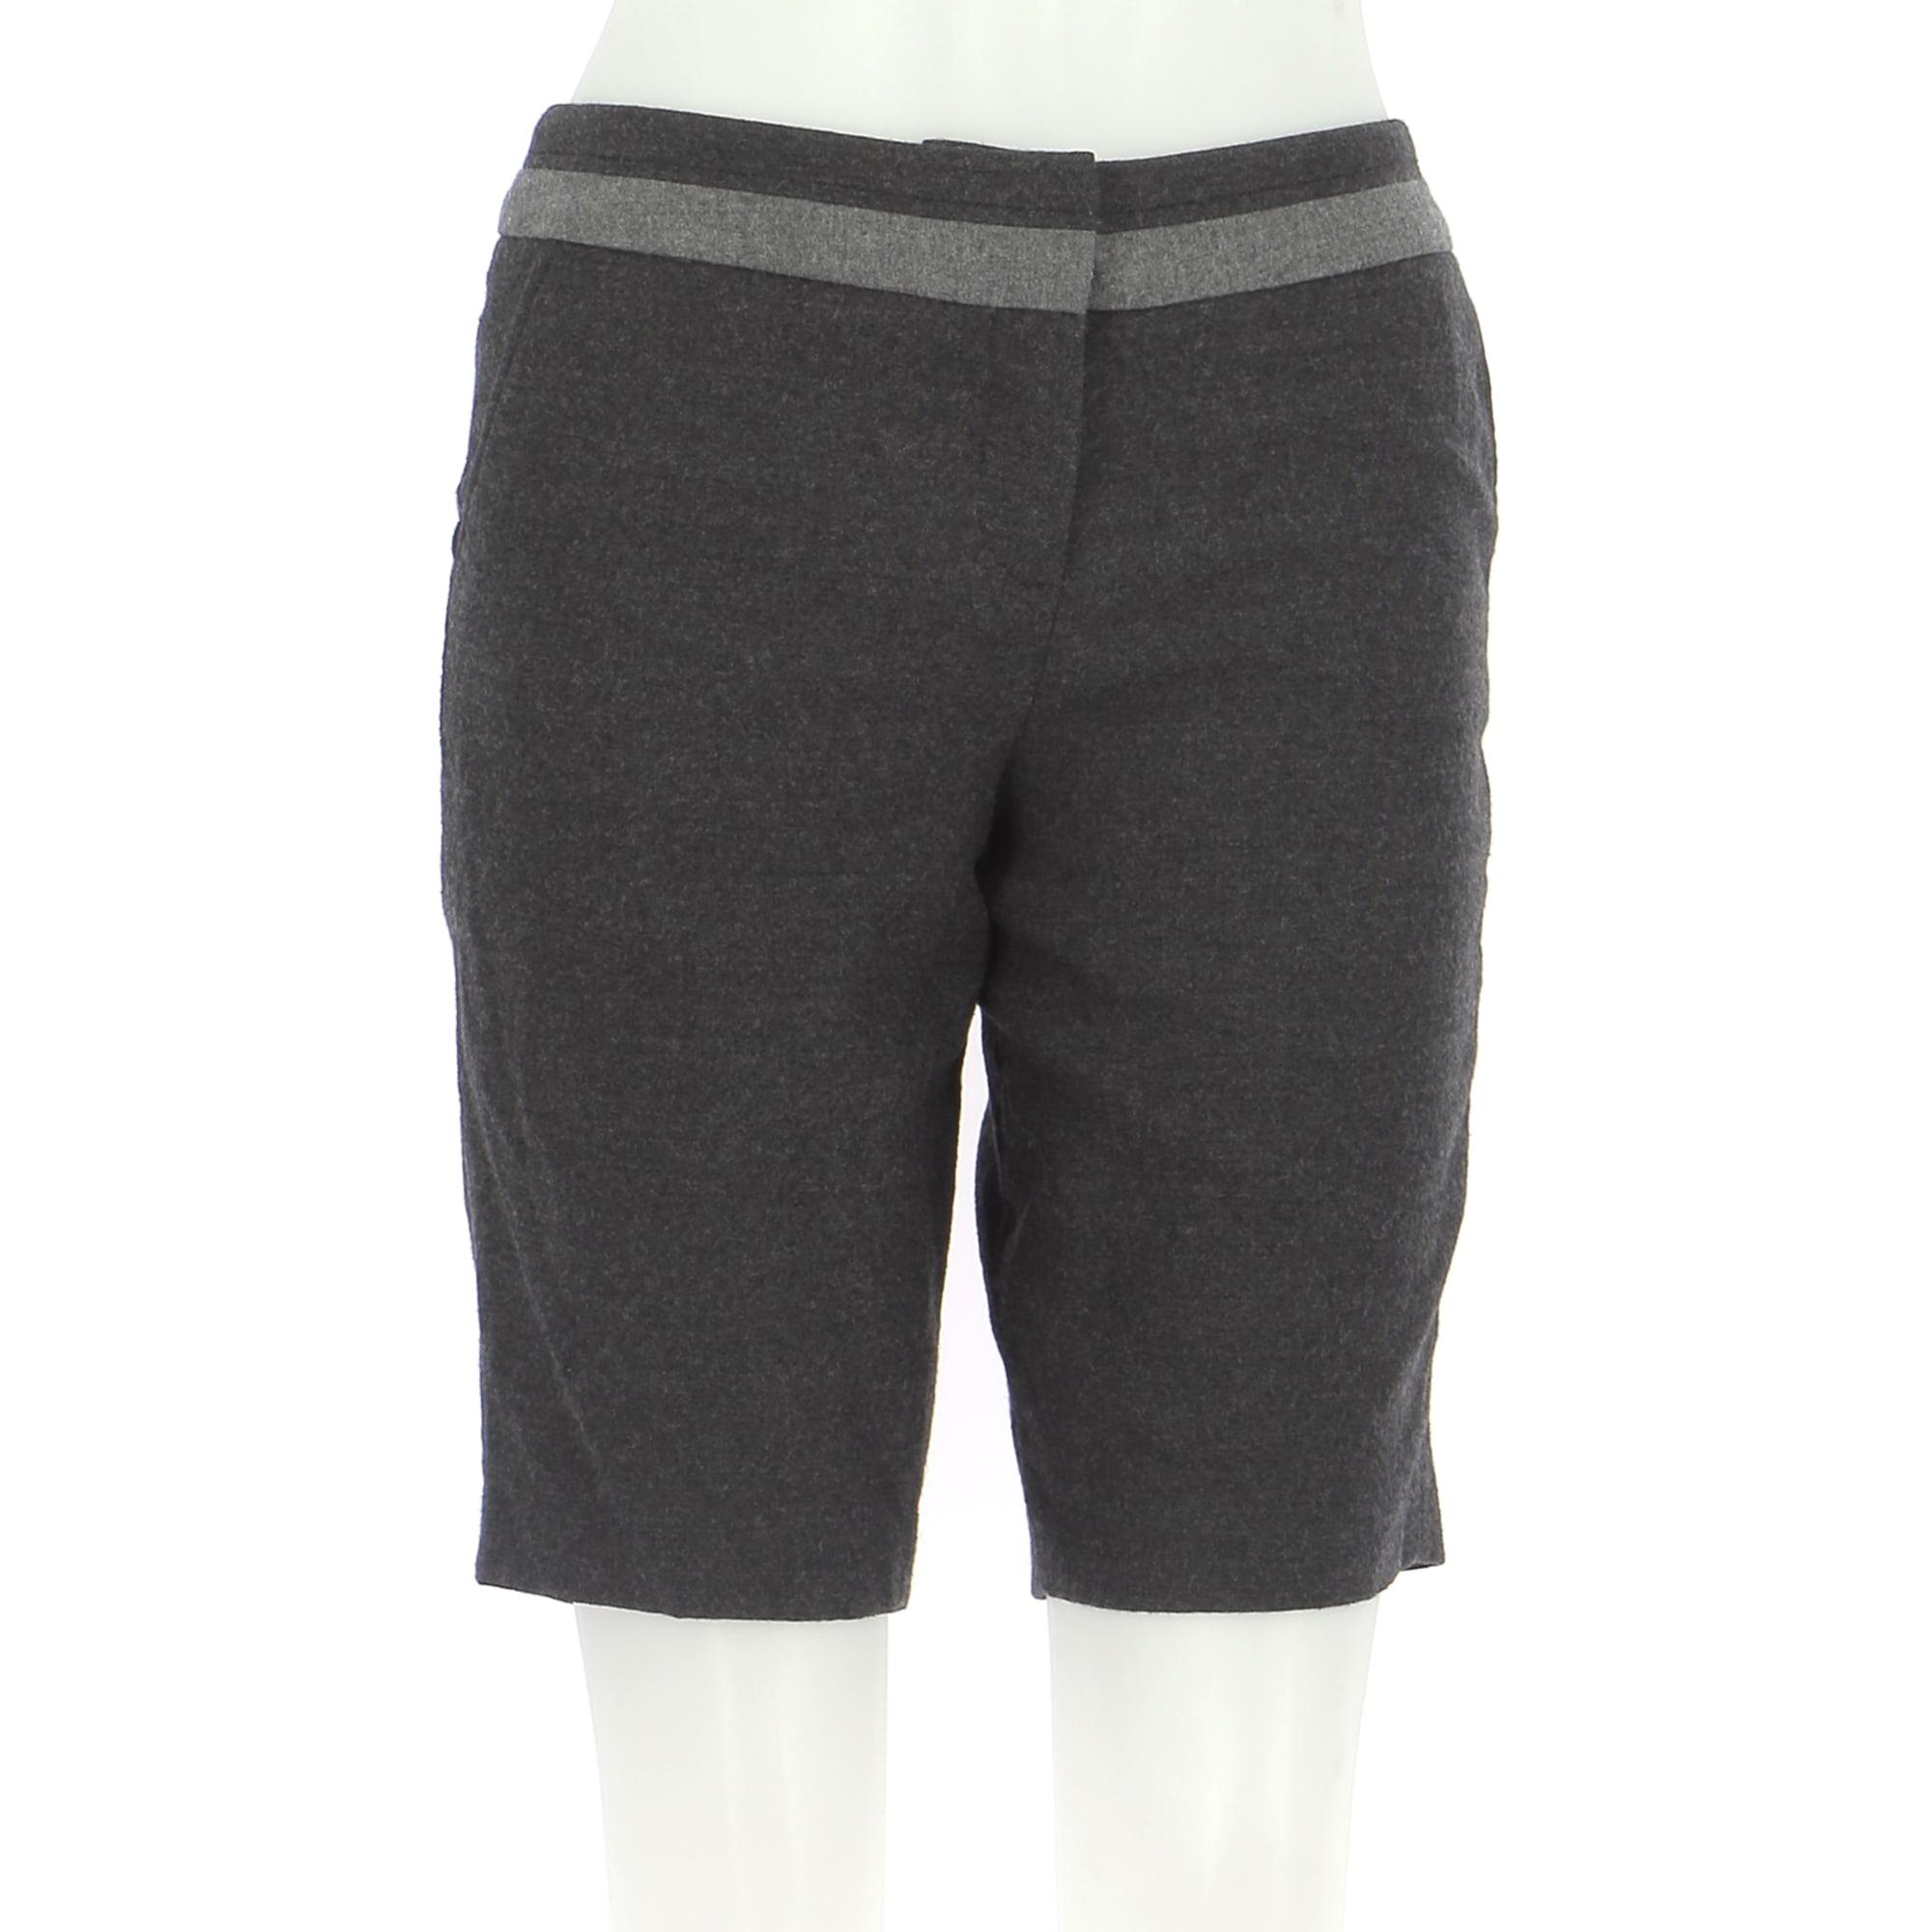 Shorts ALAIN MANOUKIAN Gray, charcoal